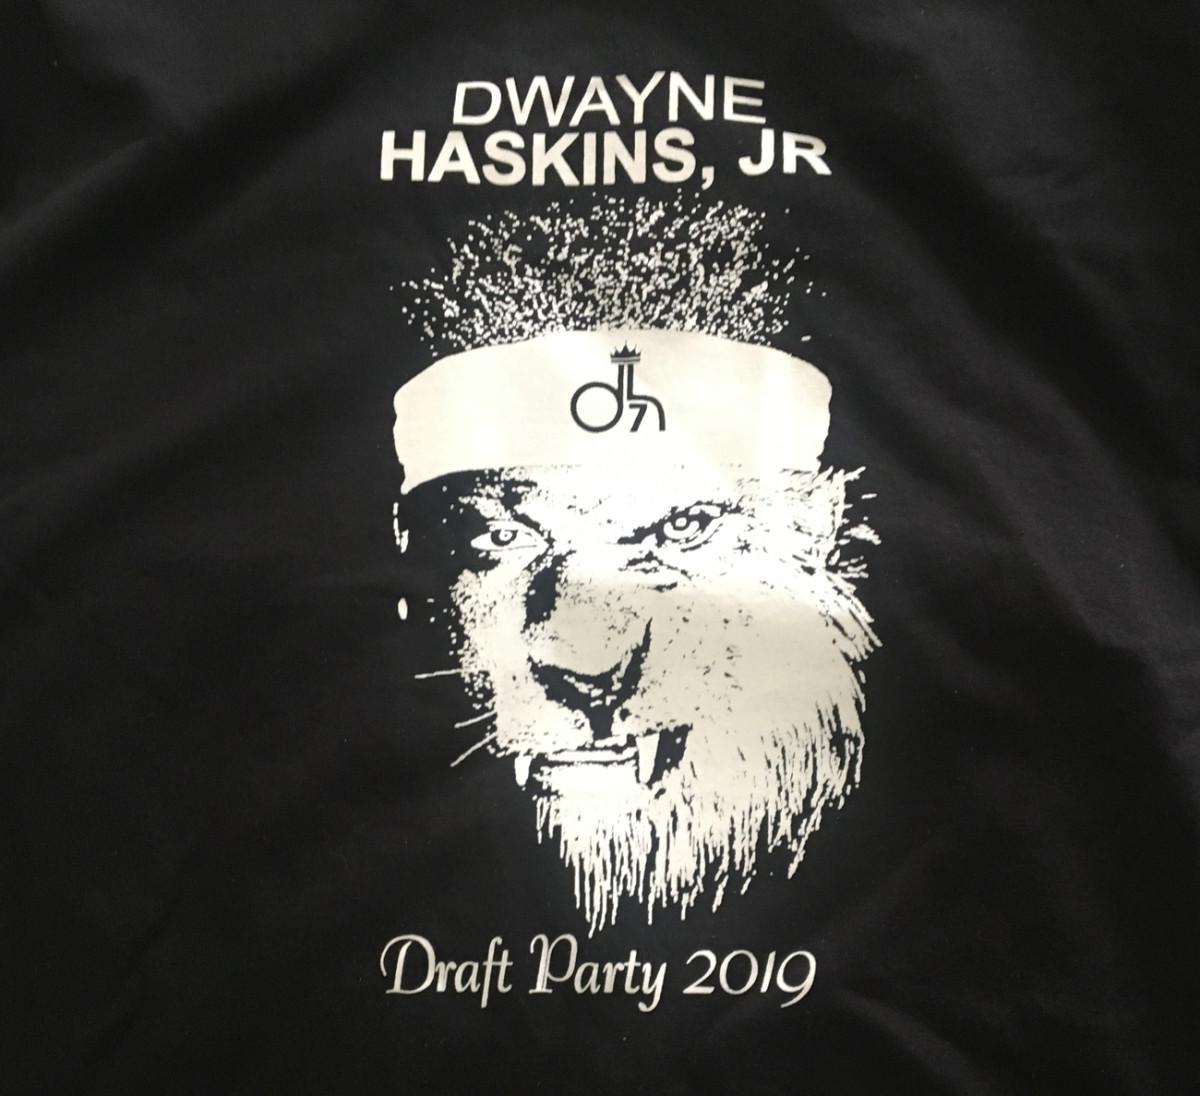 dwayne-haskins-draft-party-shirt.jpg